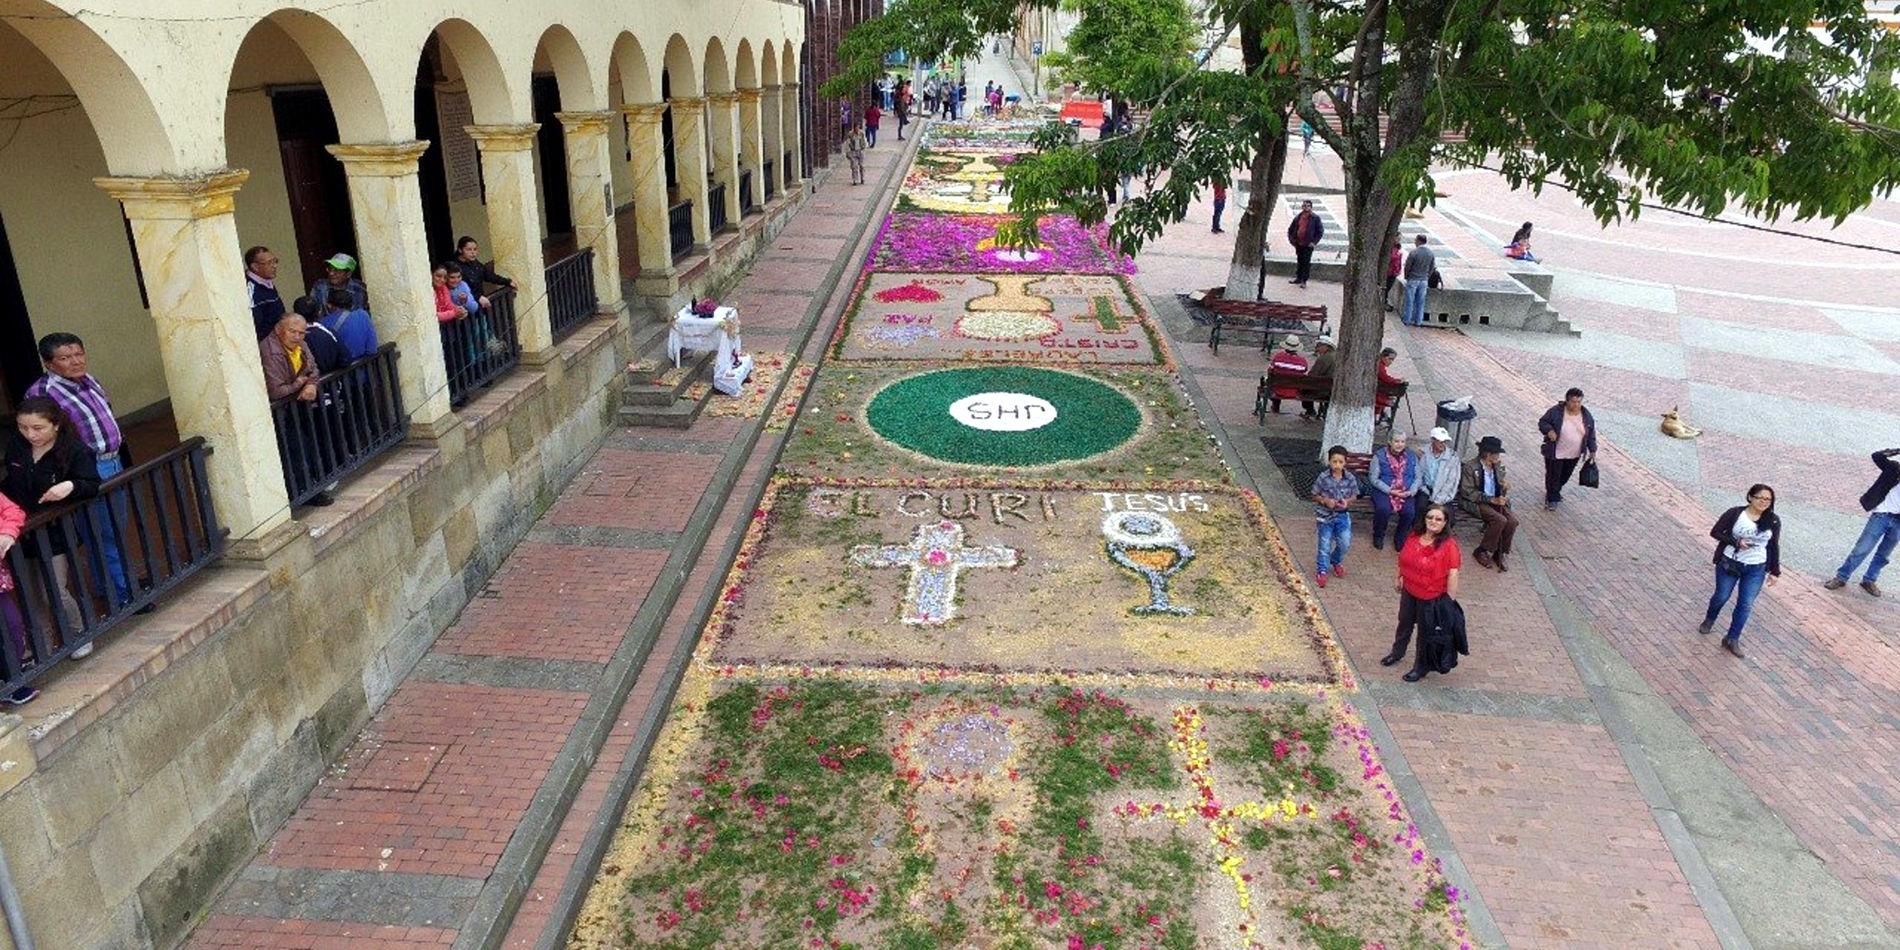 Creativo Corpus Christi en municipios de Cundinamarca - ElTiempo.com